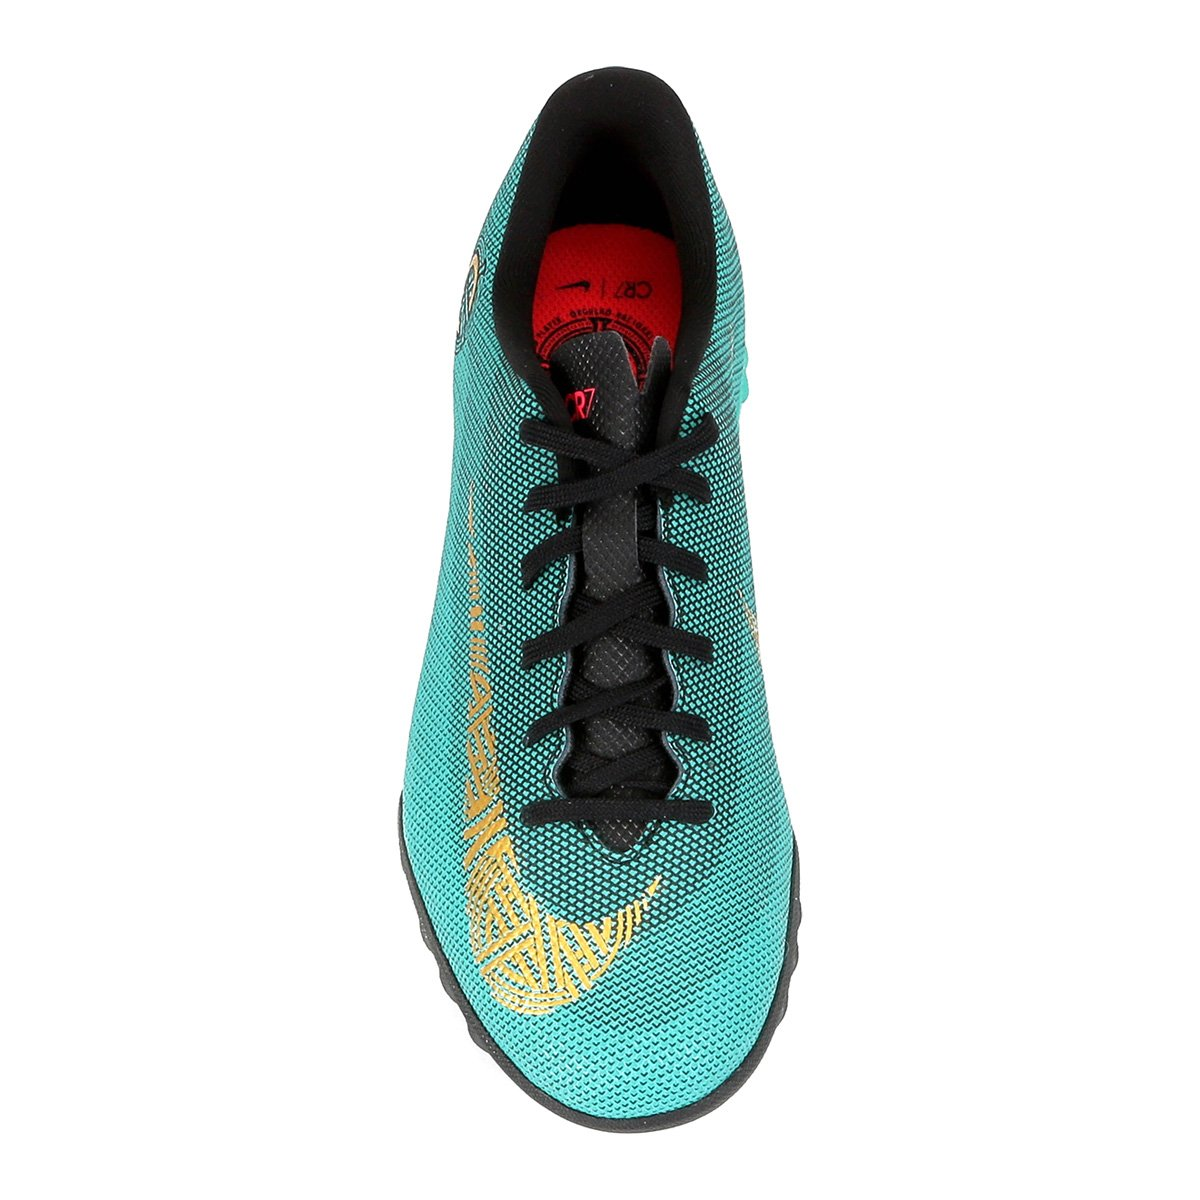 f5d22c2bb3 Chuteira Society Infantil Nike Mercurial Vapor 12 Academy GS CR7 TF ...